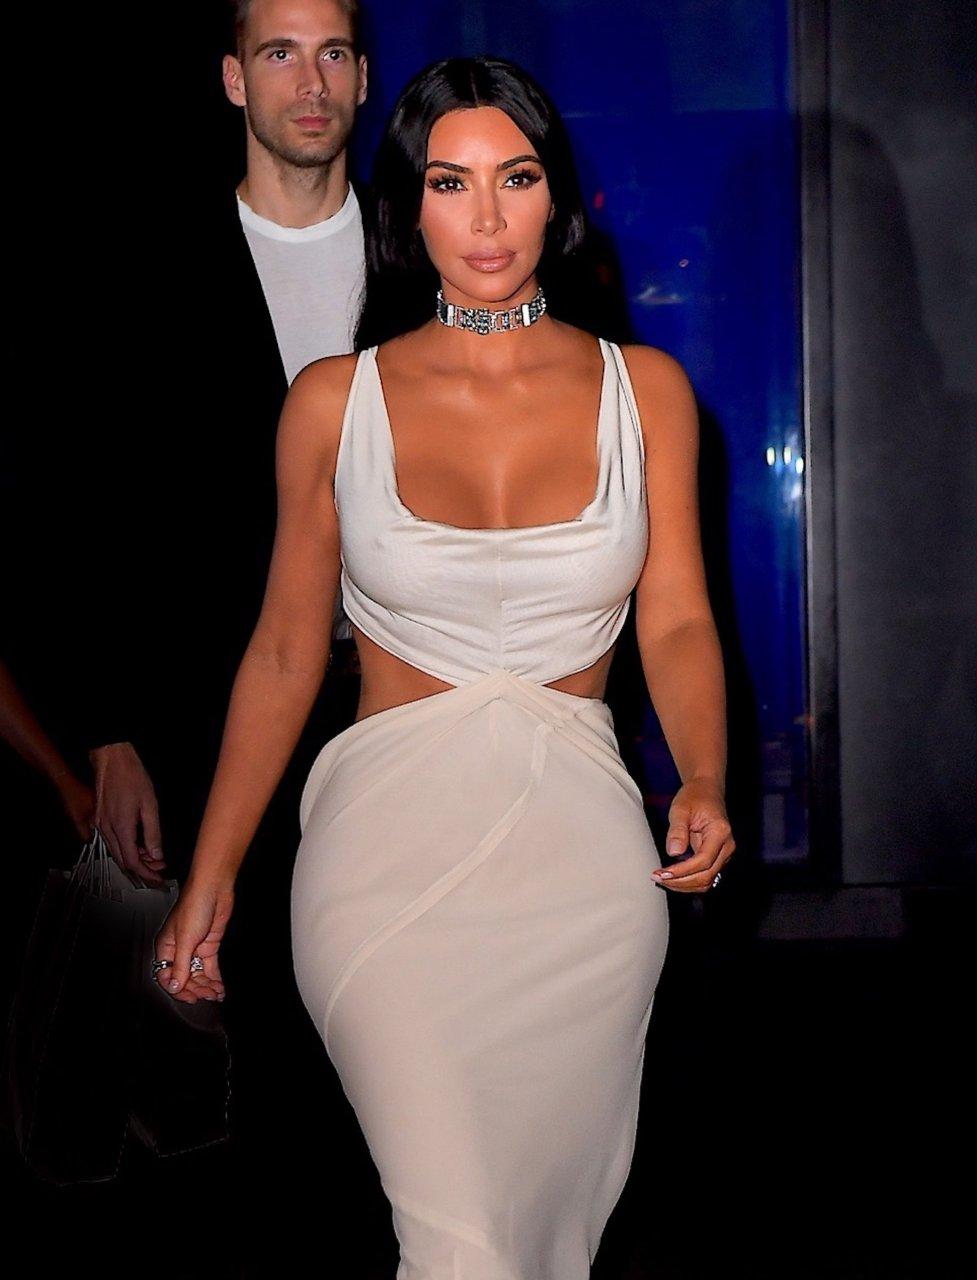 Kim-Kardashian-Sexy-TheFappeningBlog.com-25.jpg